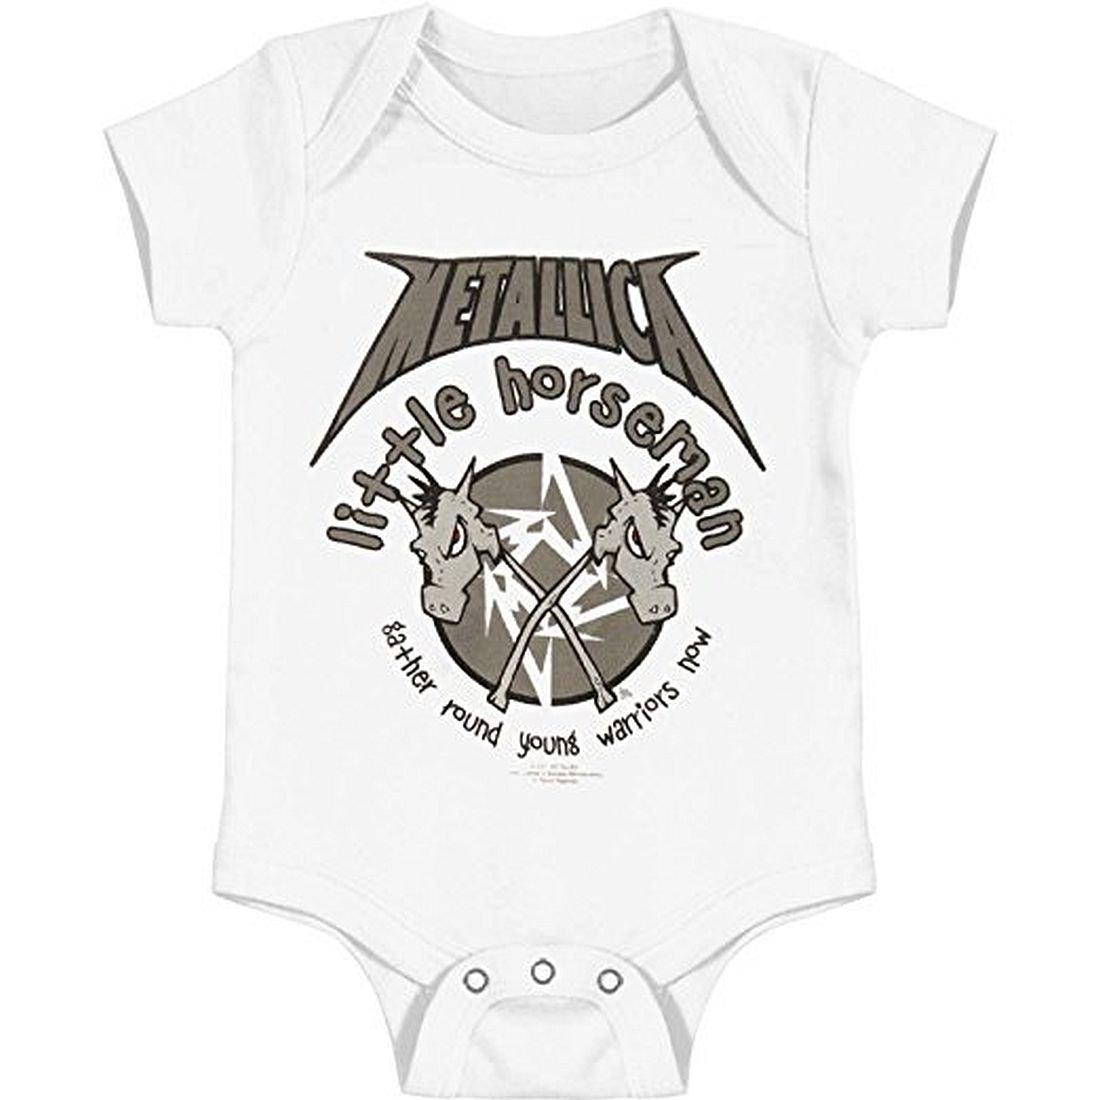 Metallica Little Horseman Infant Baby Romper T-Shirt: Amazon ...